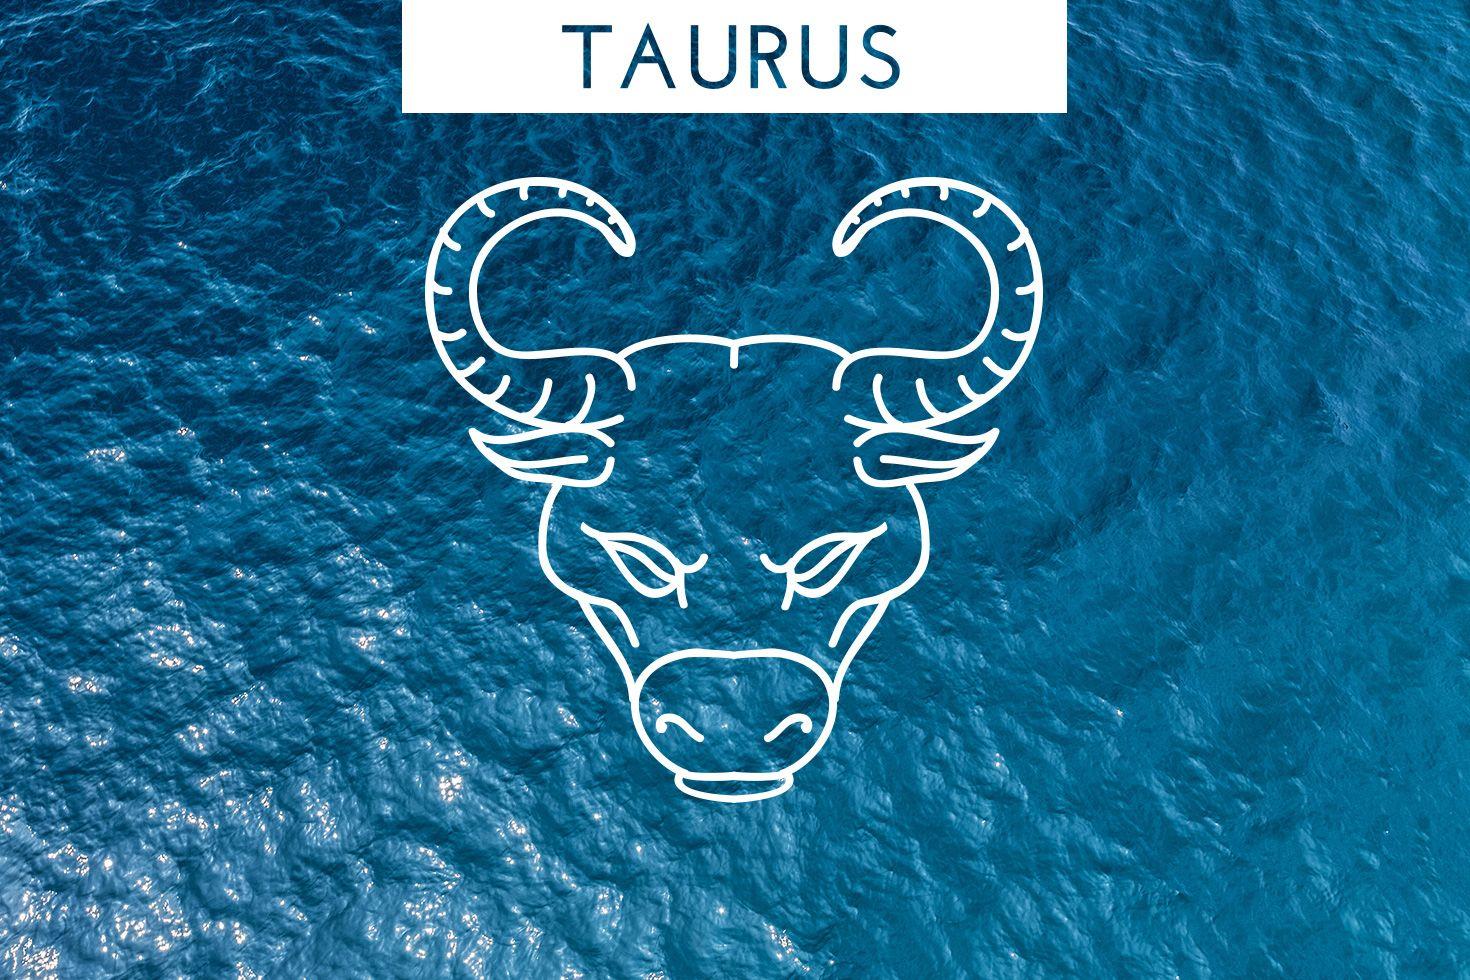 Taurus zodiac horoscope symbol